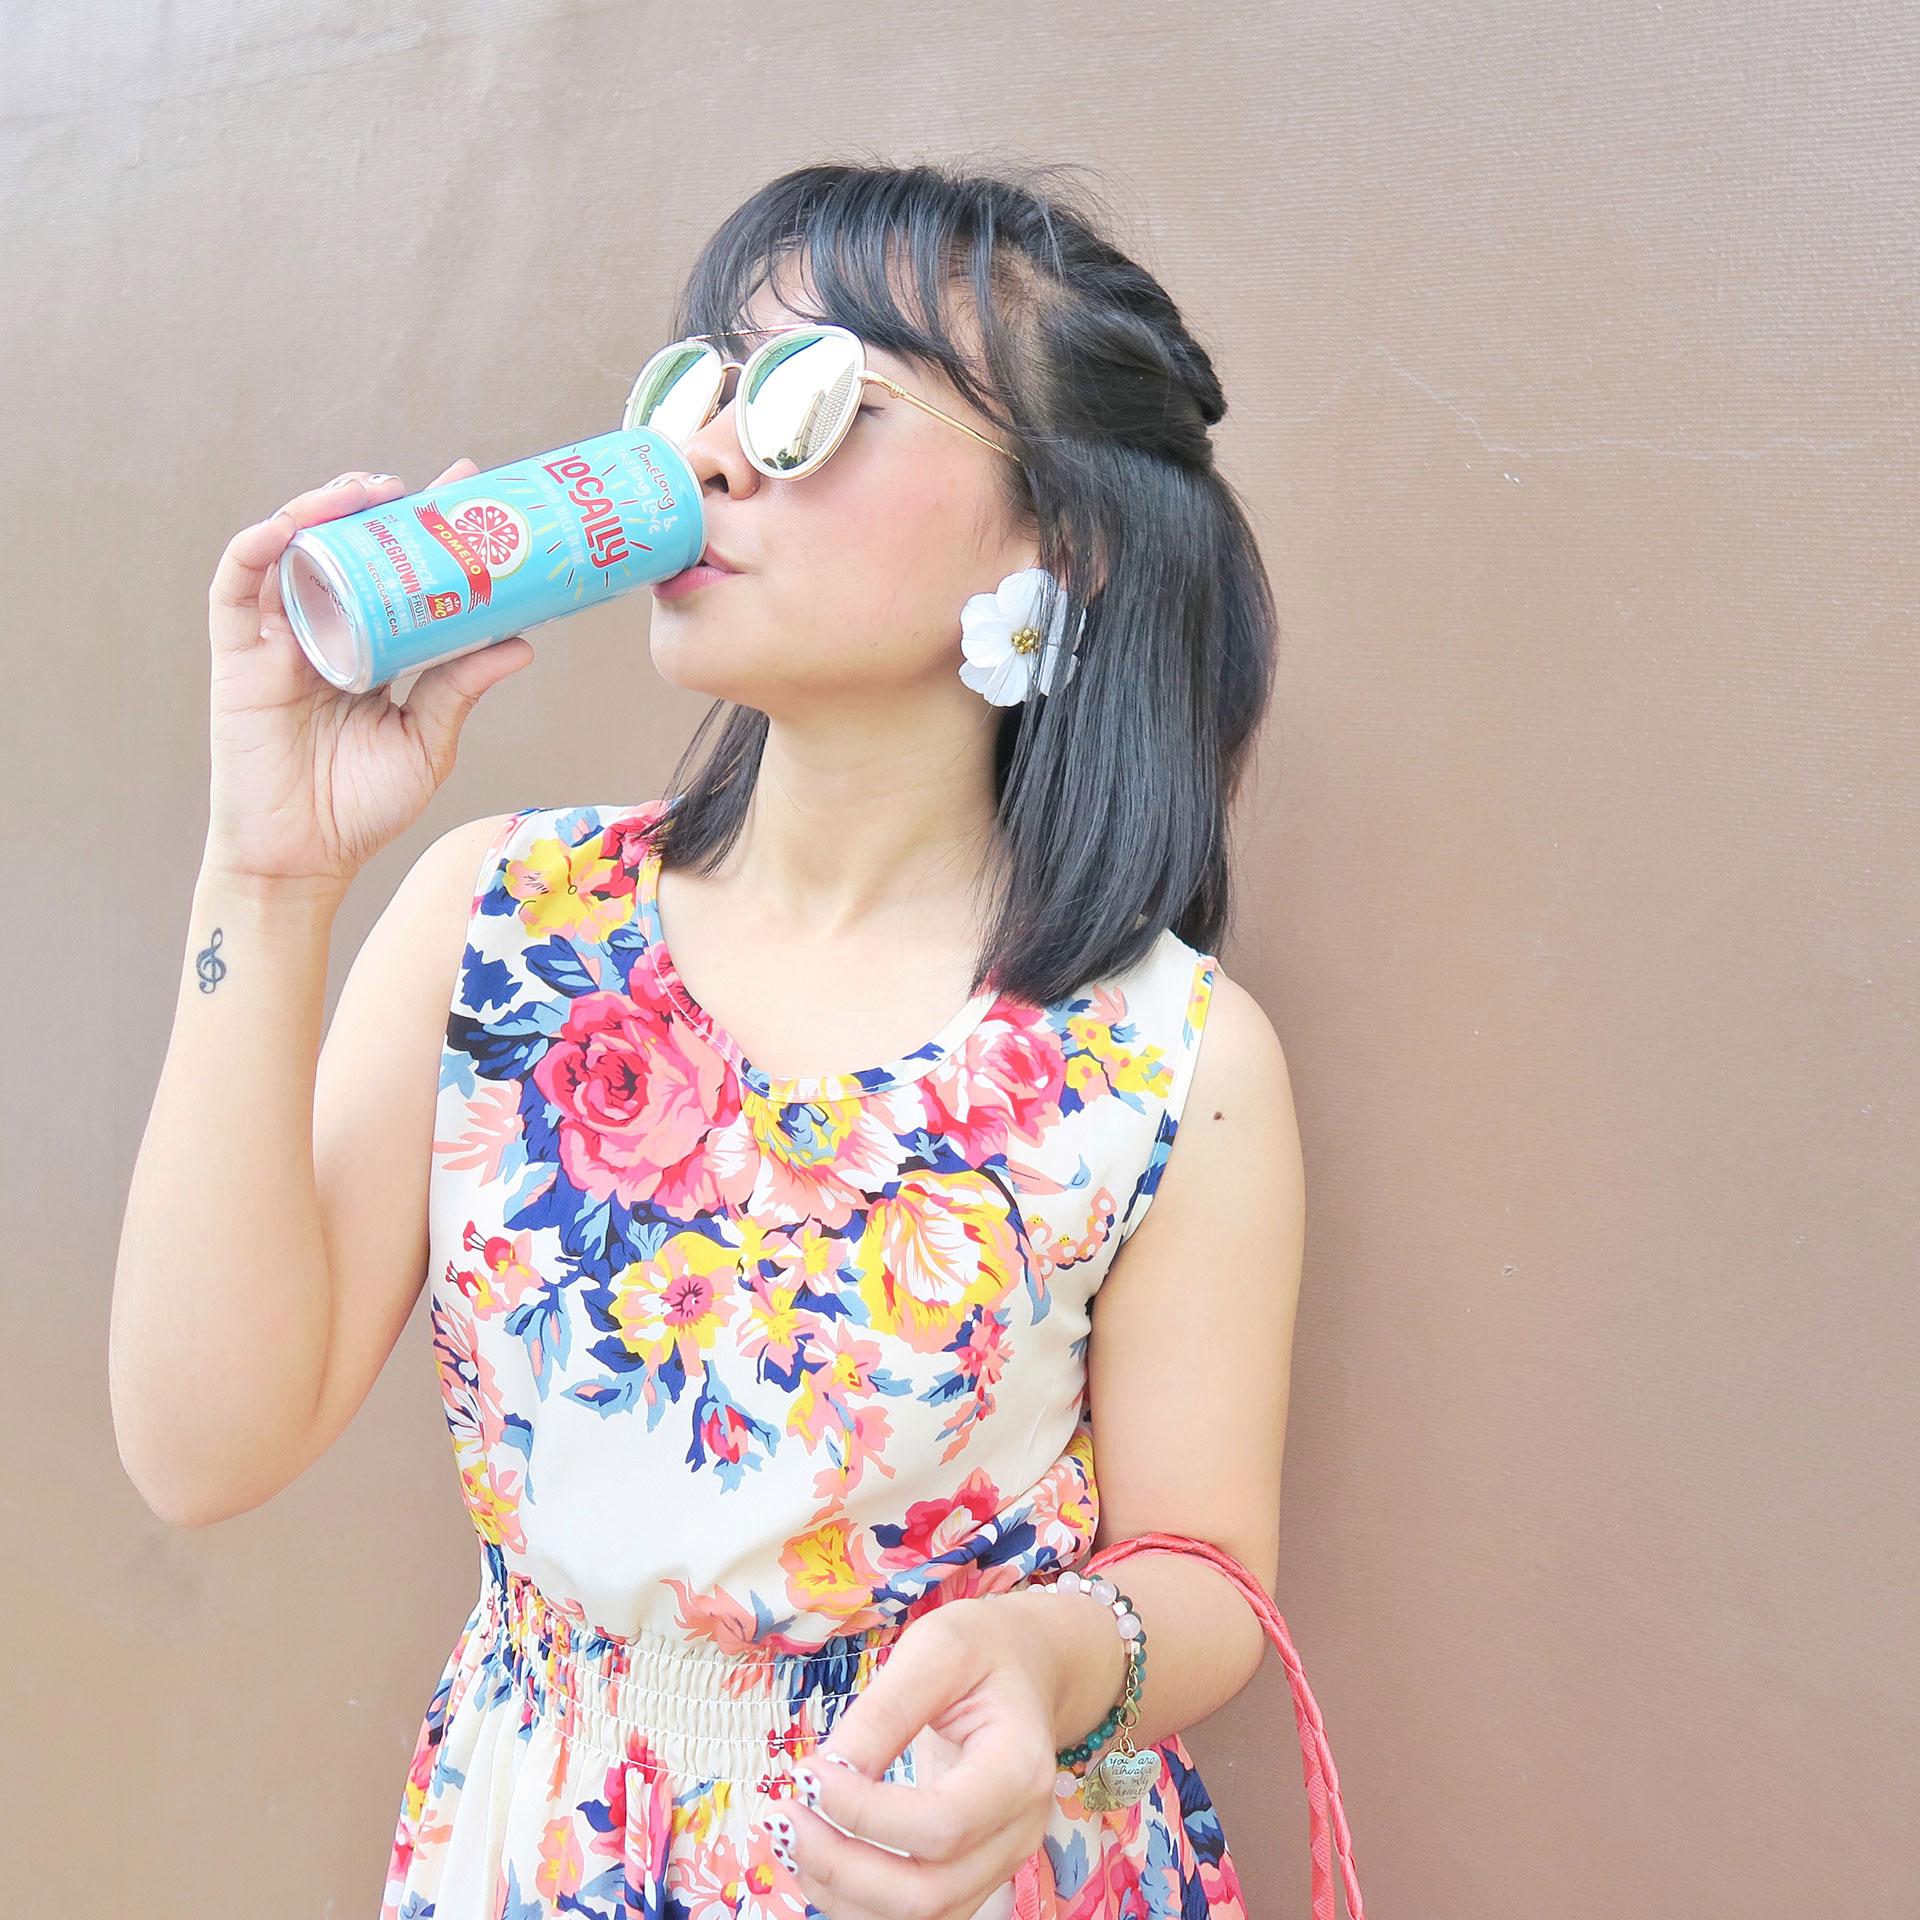 18 Locally Blended Juice Drink Review Photos - Gen-zel She Sings Beauty